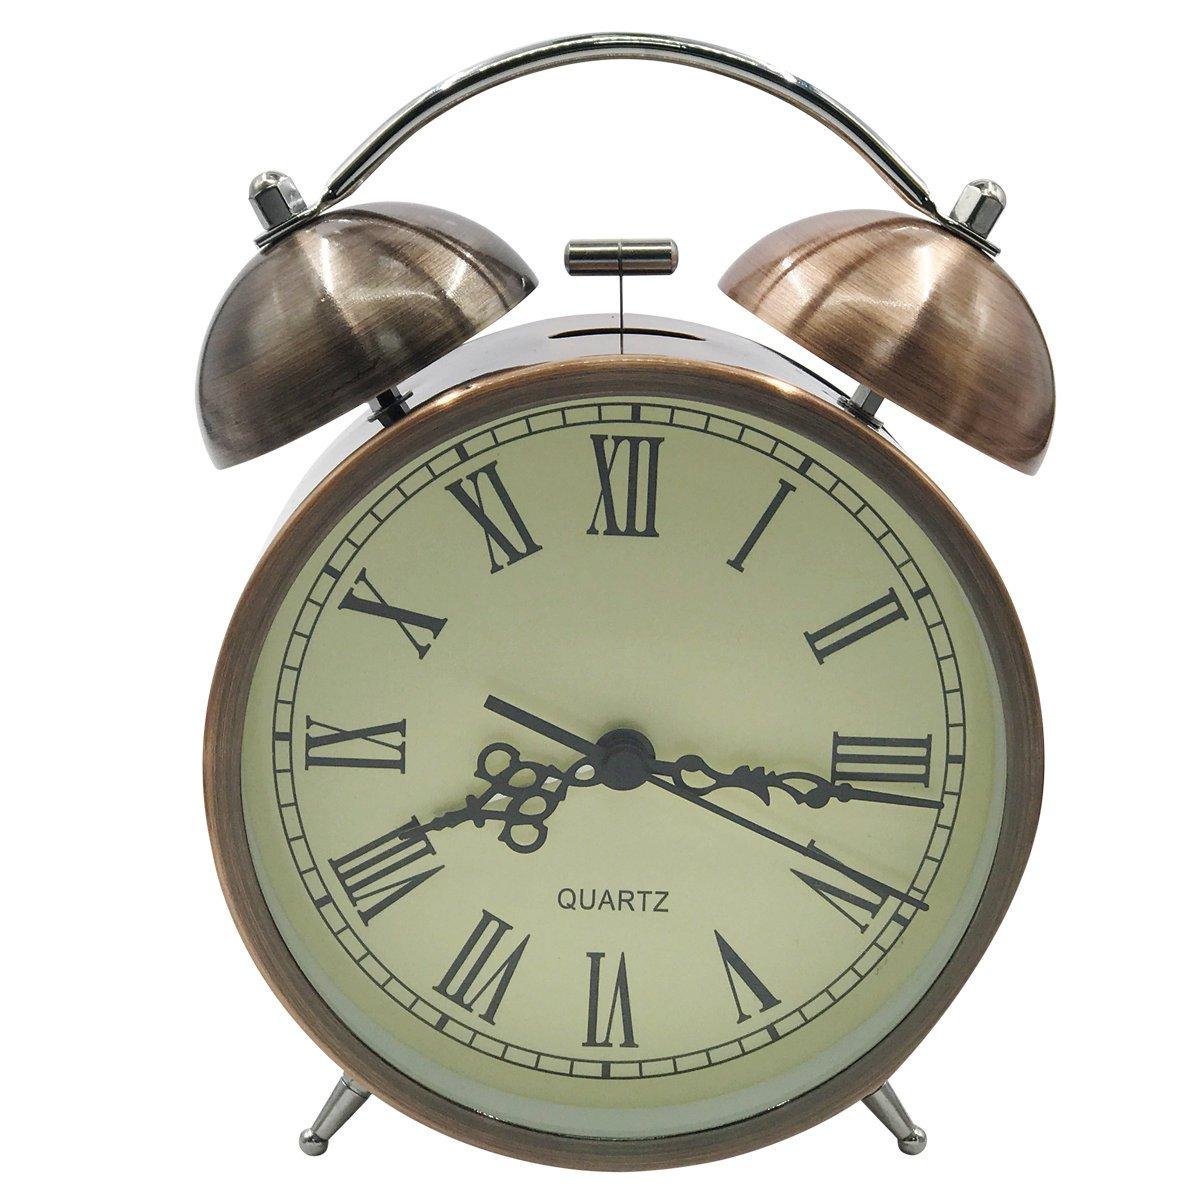 Reloj vintage de mesa silenciosohttps://amzn.to/2SL4udF